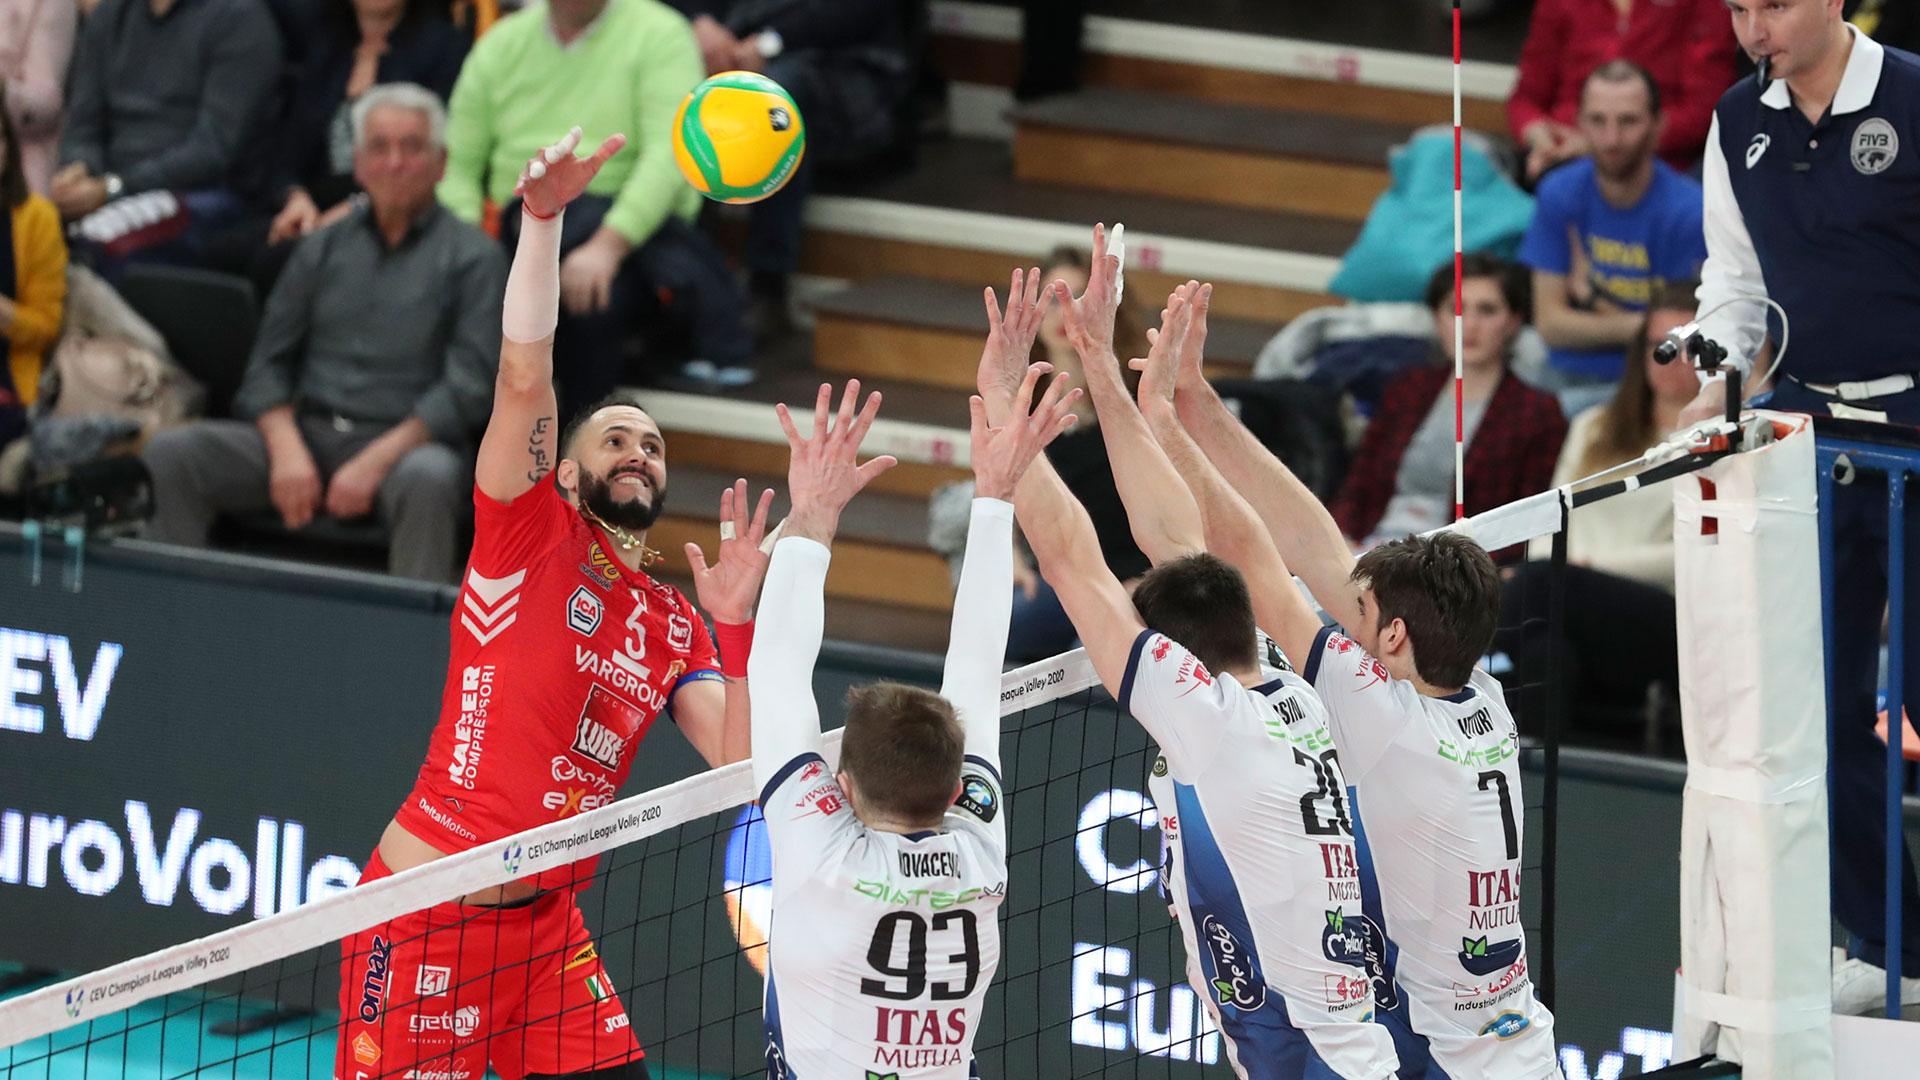 Itas Trentino-Lube 1-3, biancorossi primi nel girone Champions